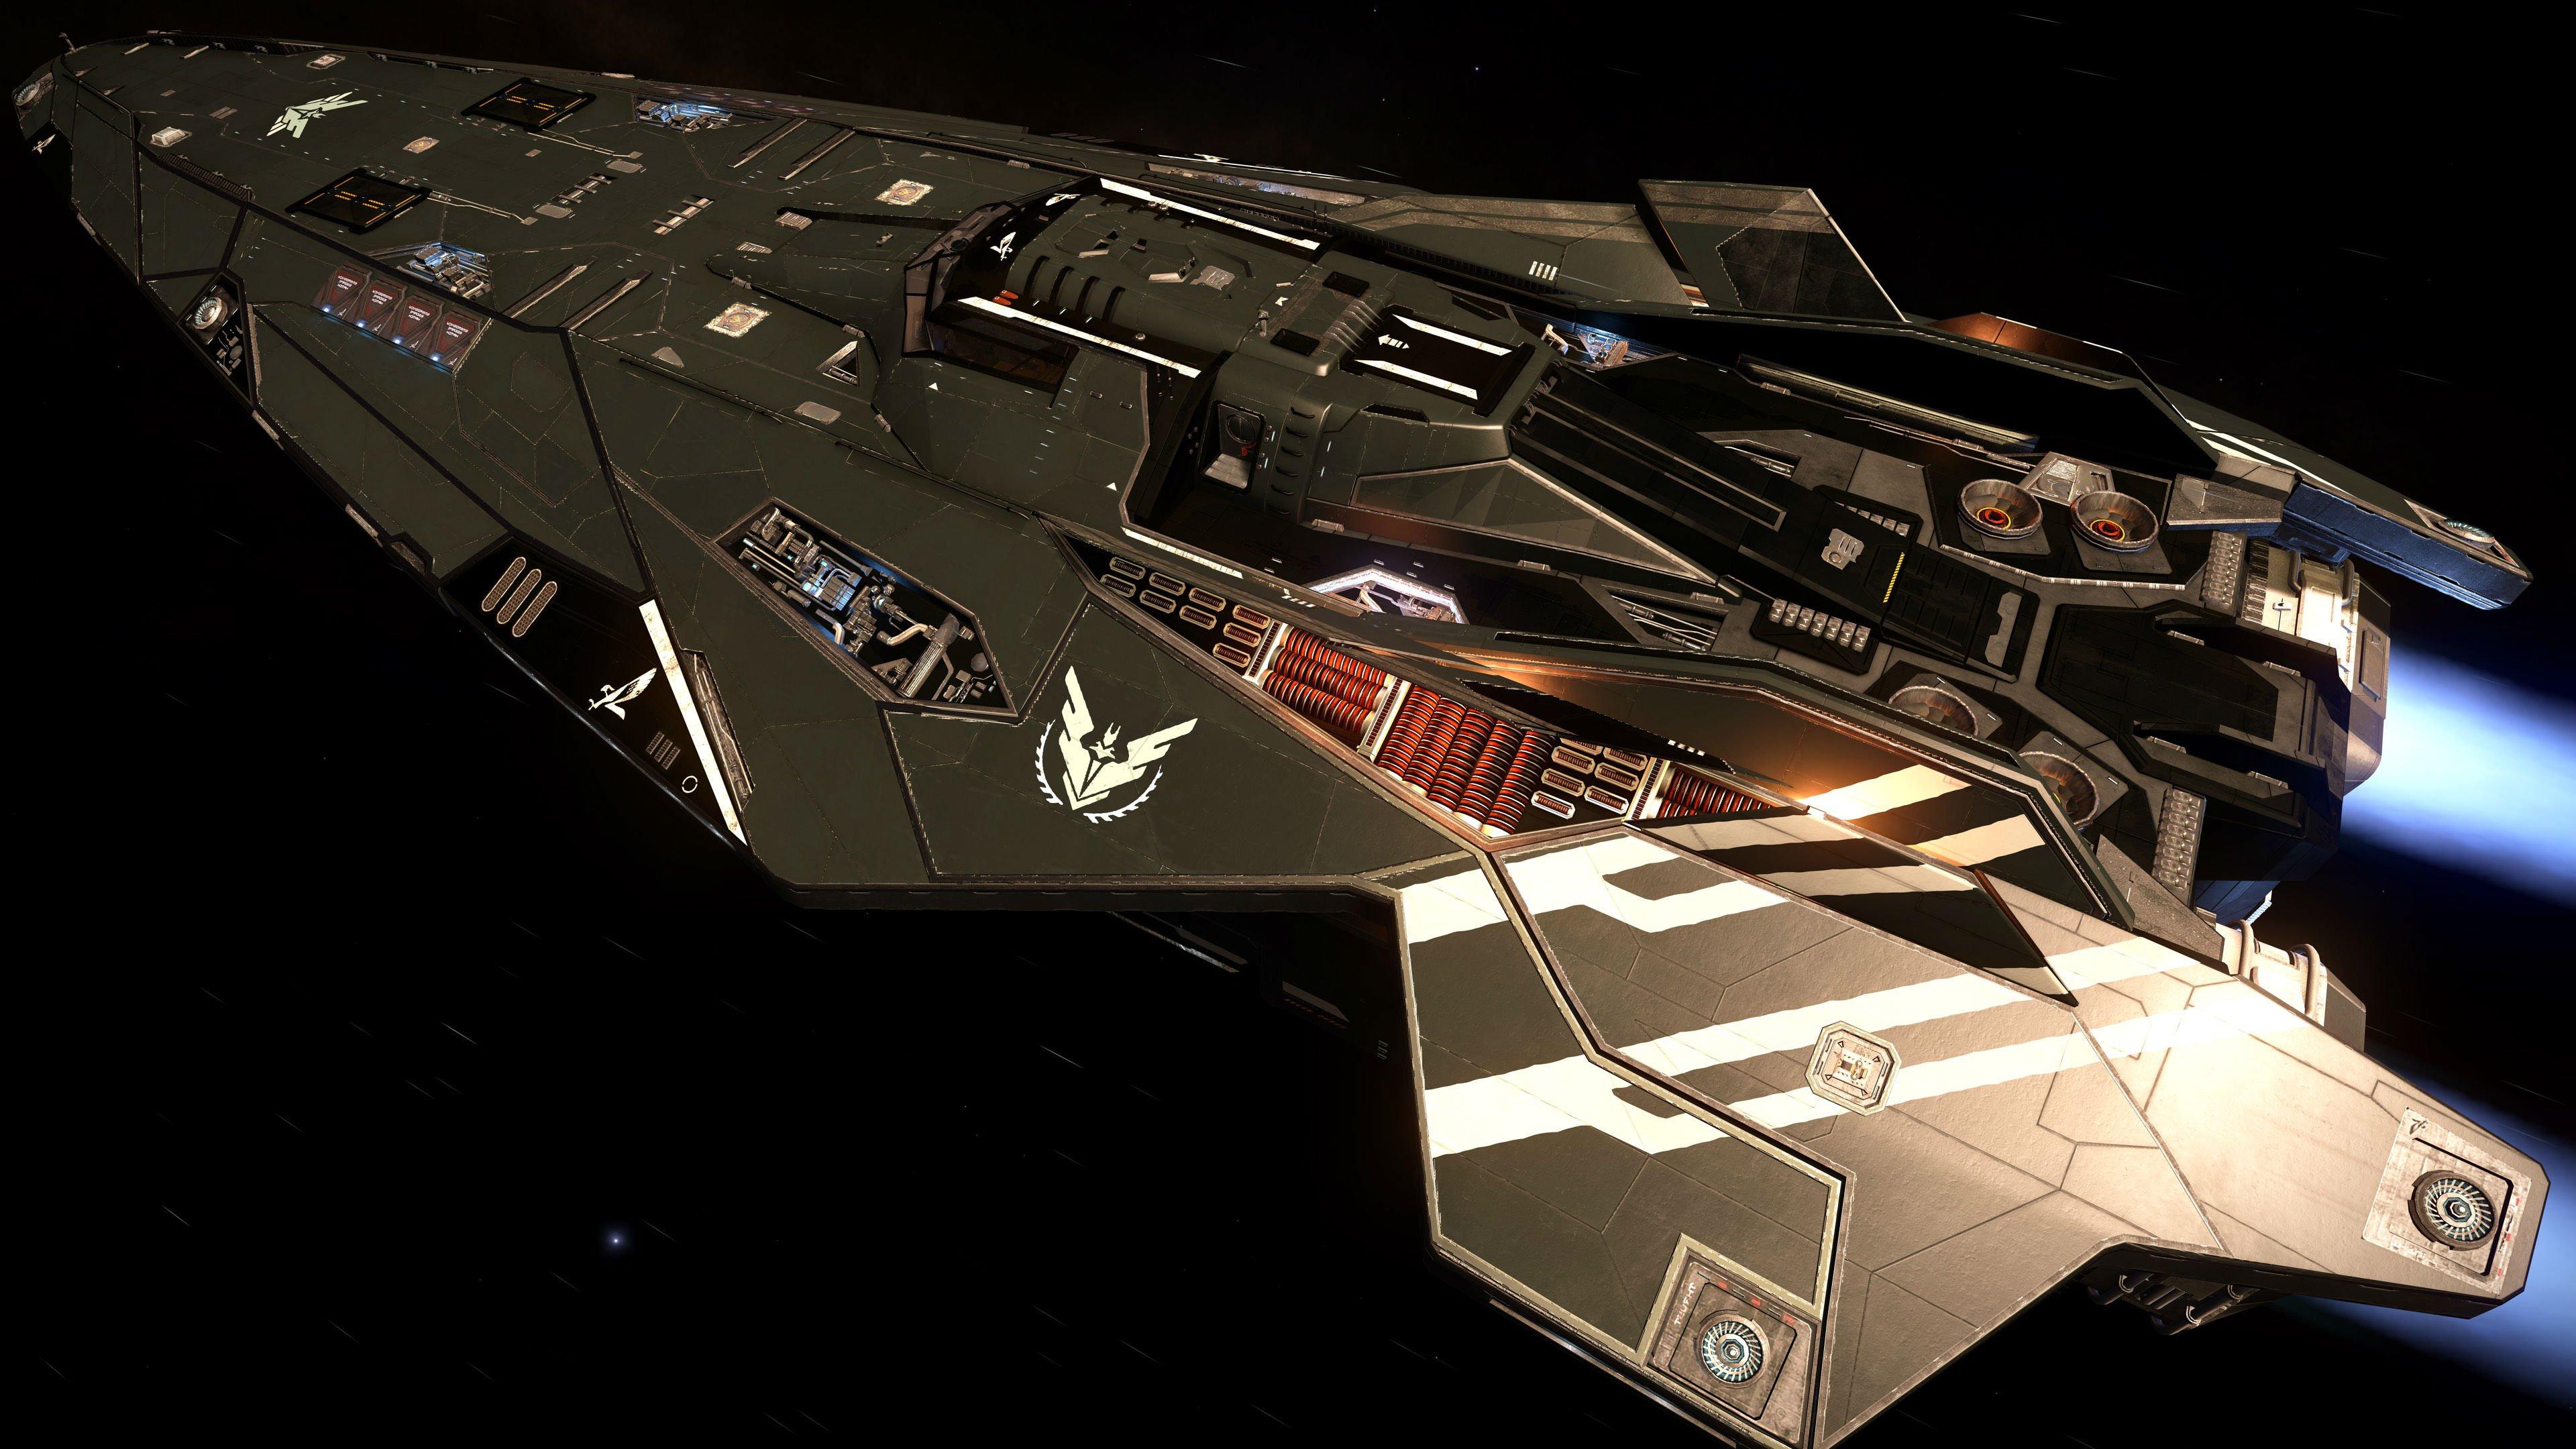 elite, Dangerous, Sci fi, Spaceship, Mmo, Rpg, Online